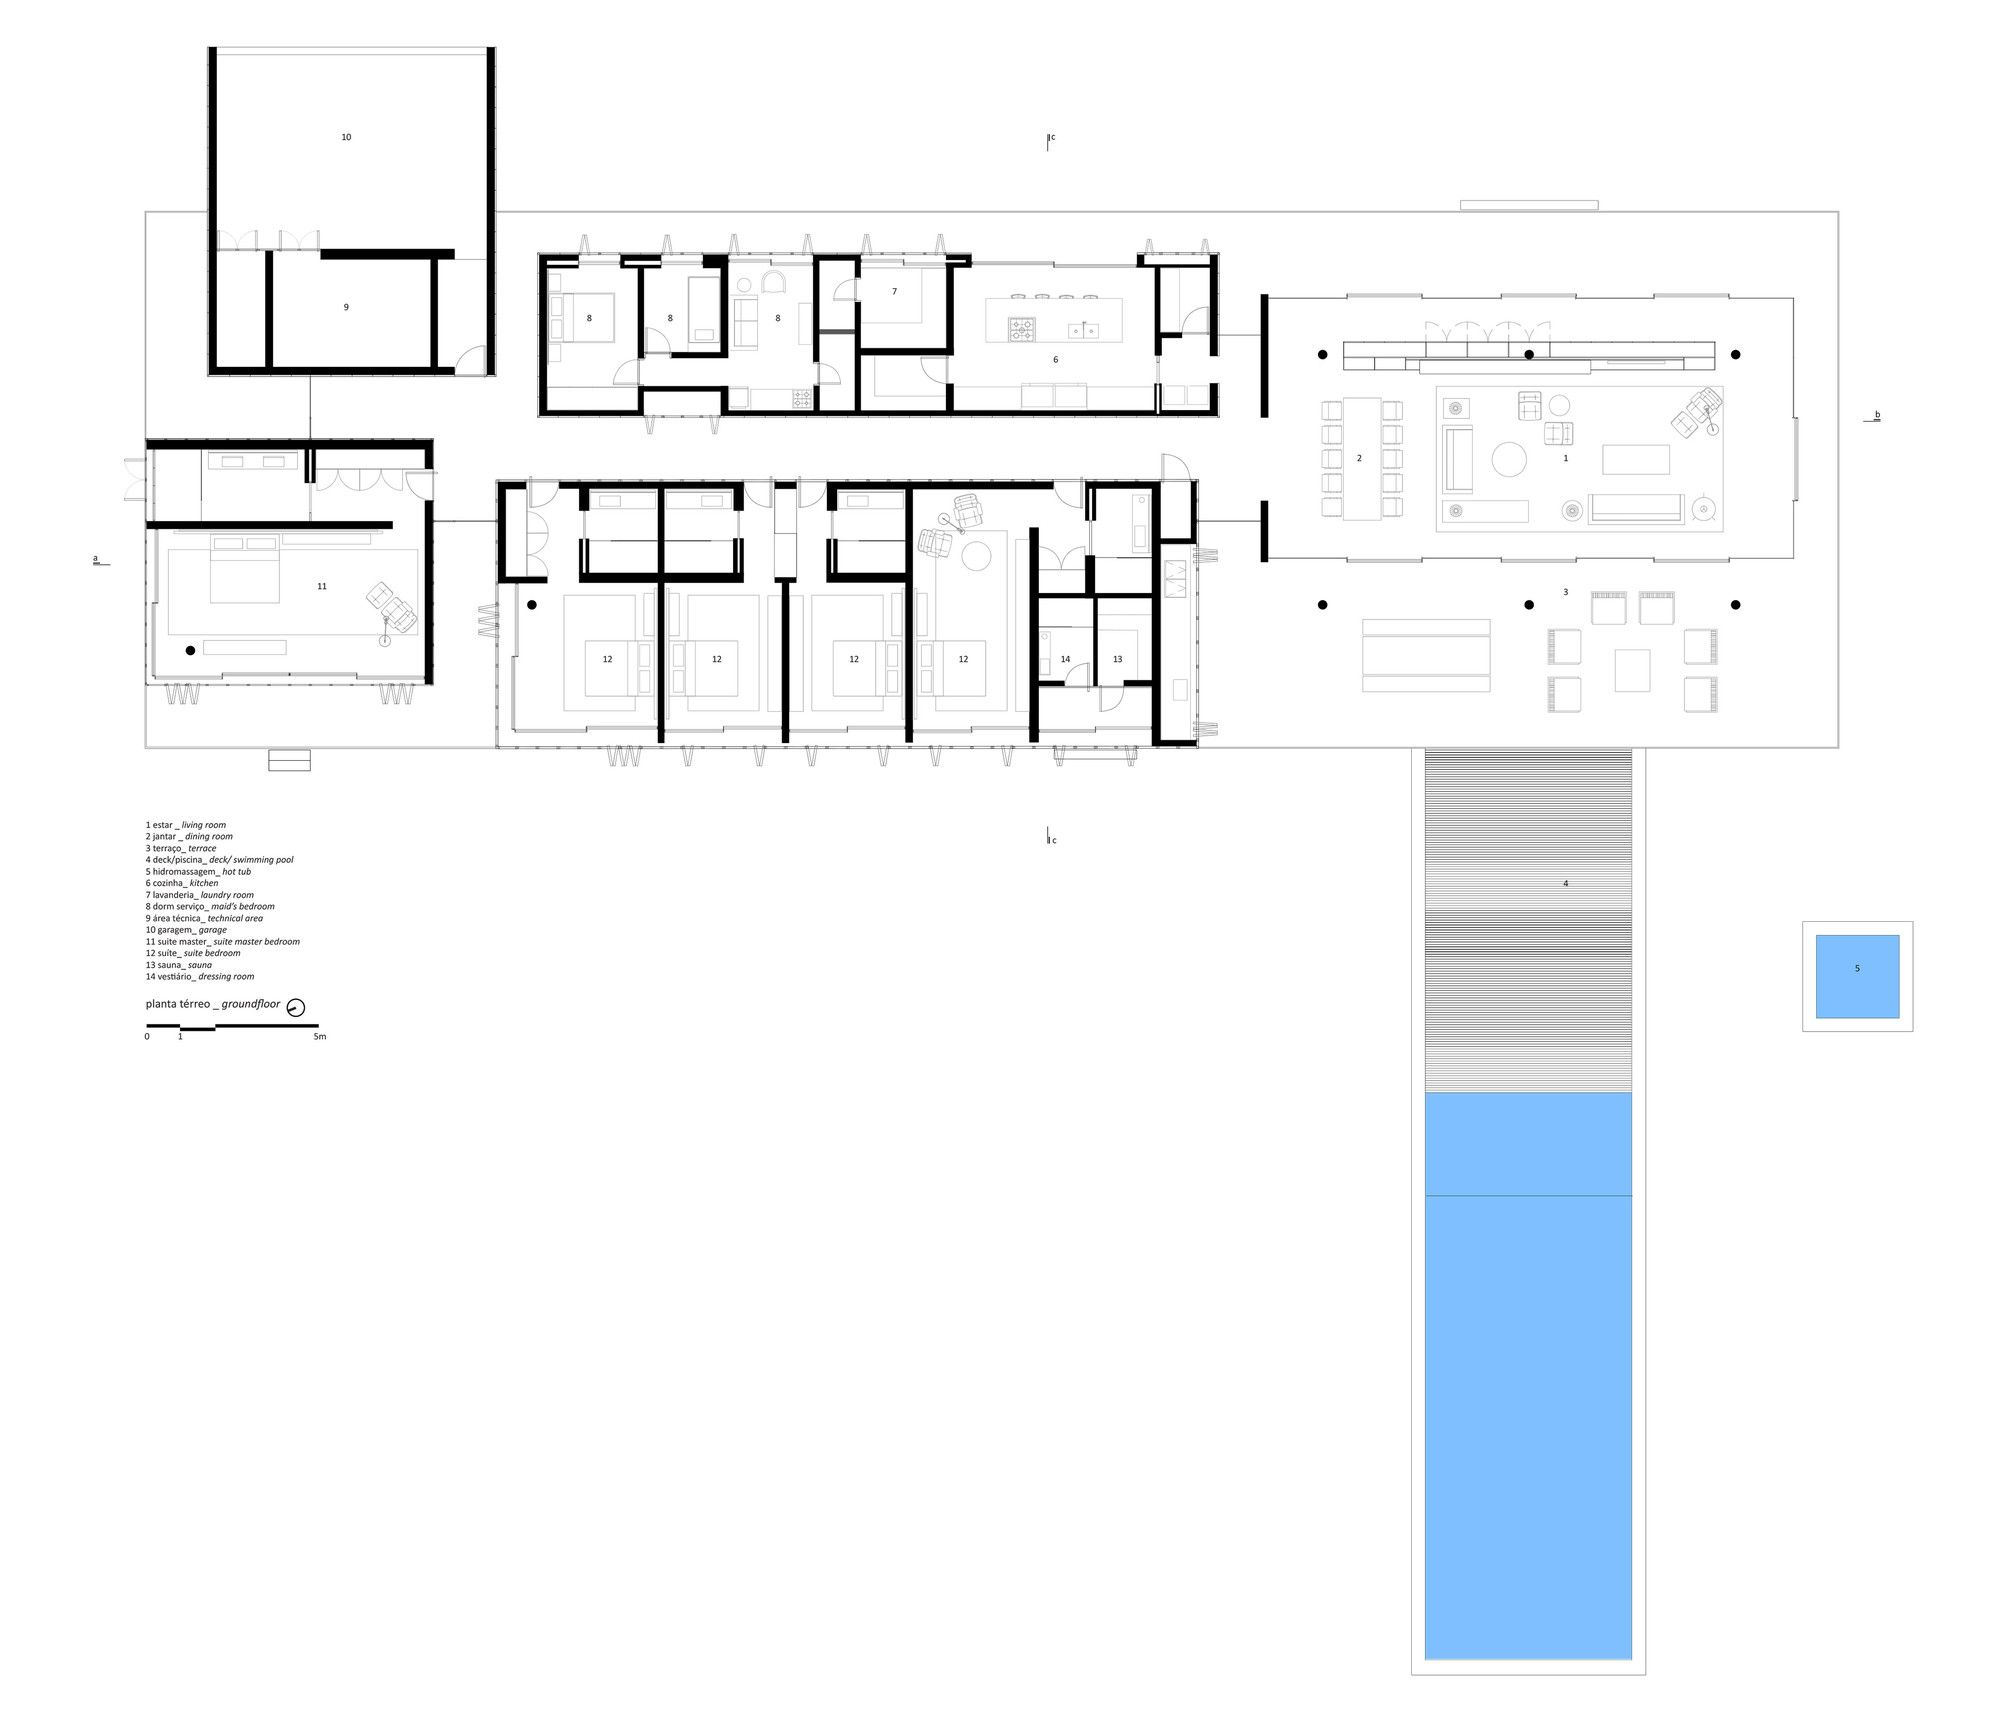 Open layout house concept by studio mk27 - Gallery Of Redux House Studio Mk27 Marcio Kogan Samanta Cafardo 51